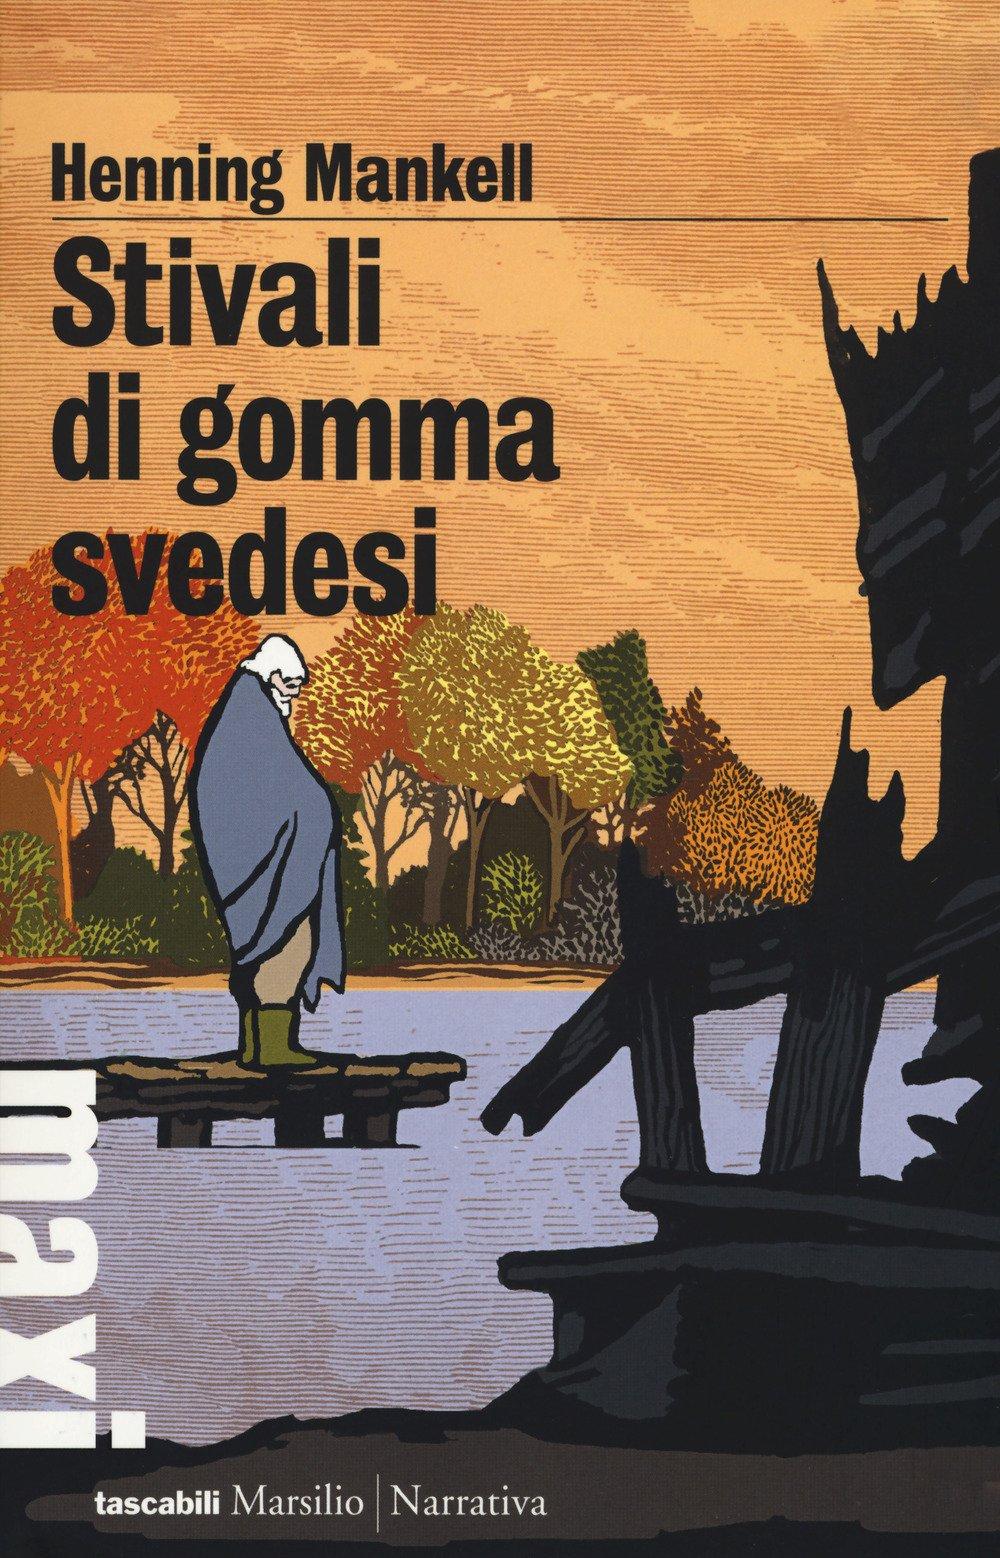 Amazon.it: Stivali di gomma svedesi Mankell, Henning